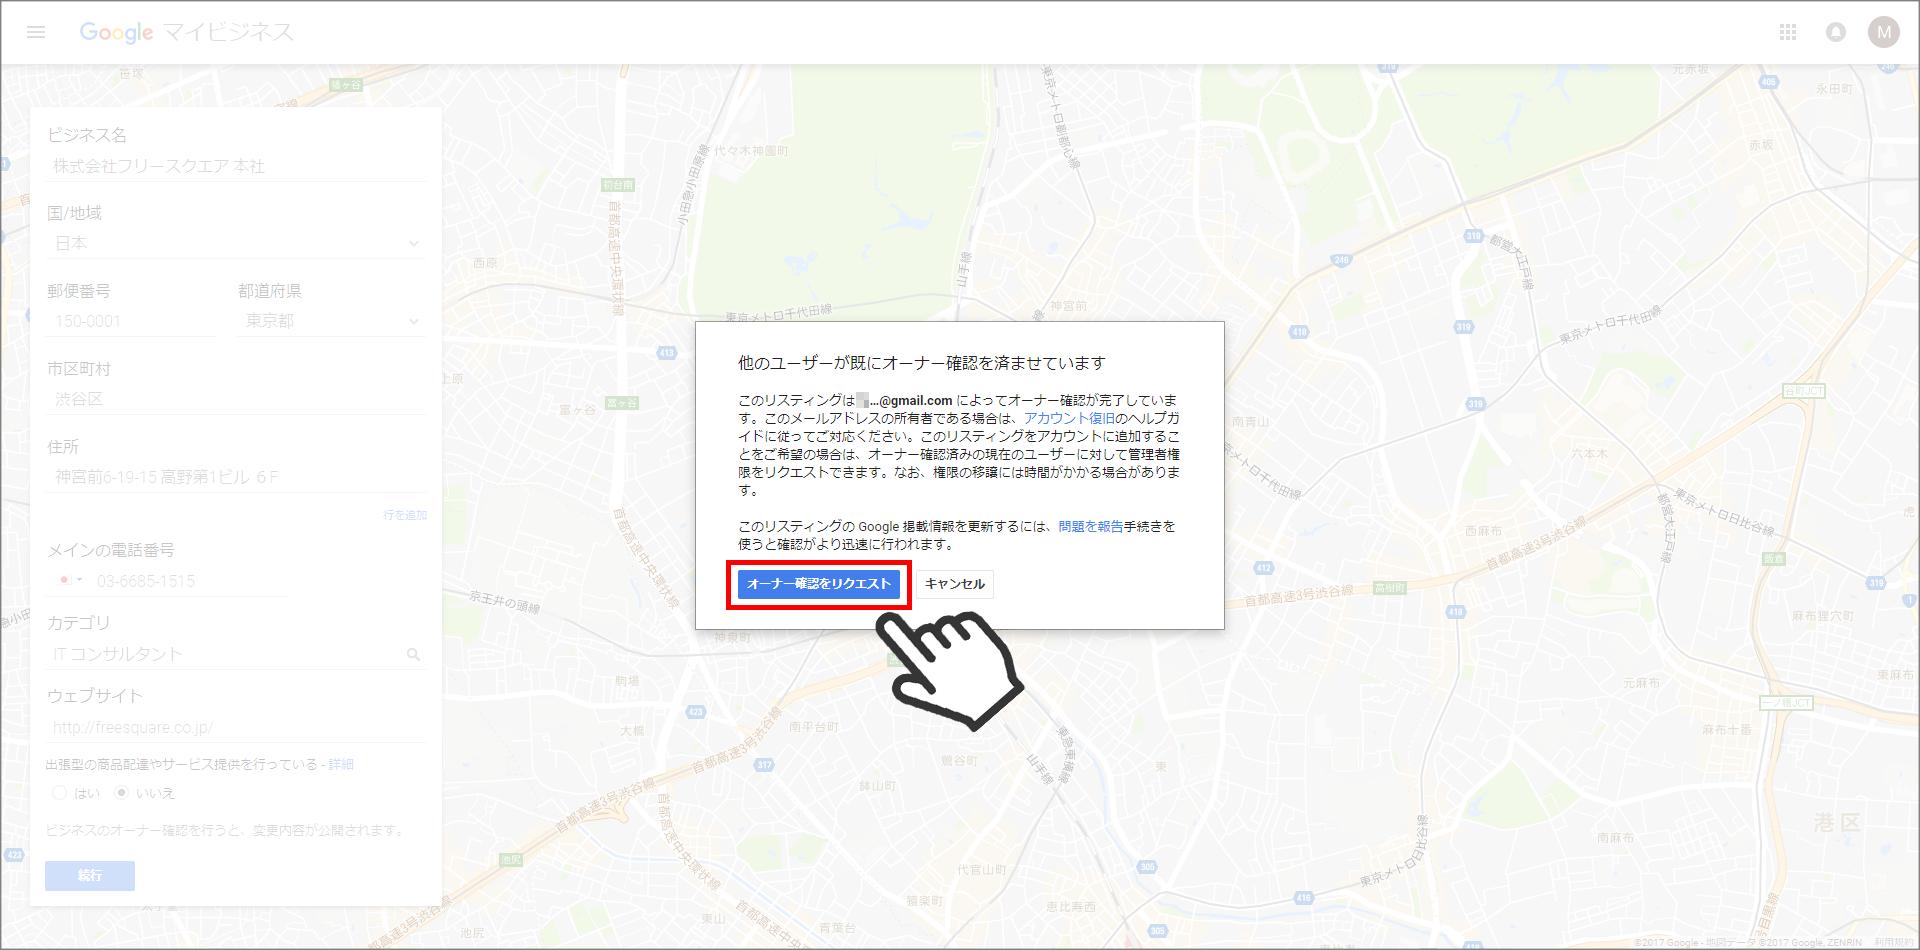 Googleアカウント オーナー権限をリクエスト